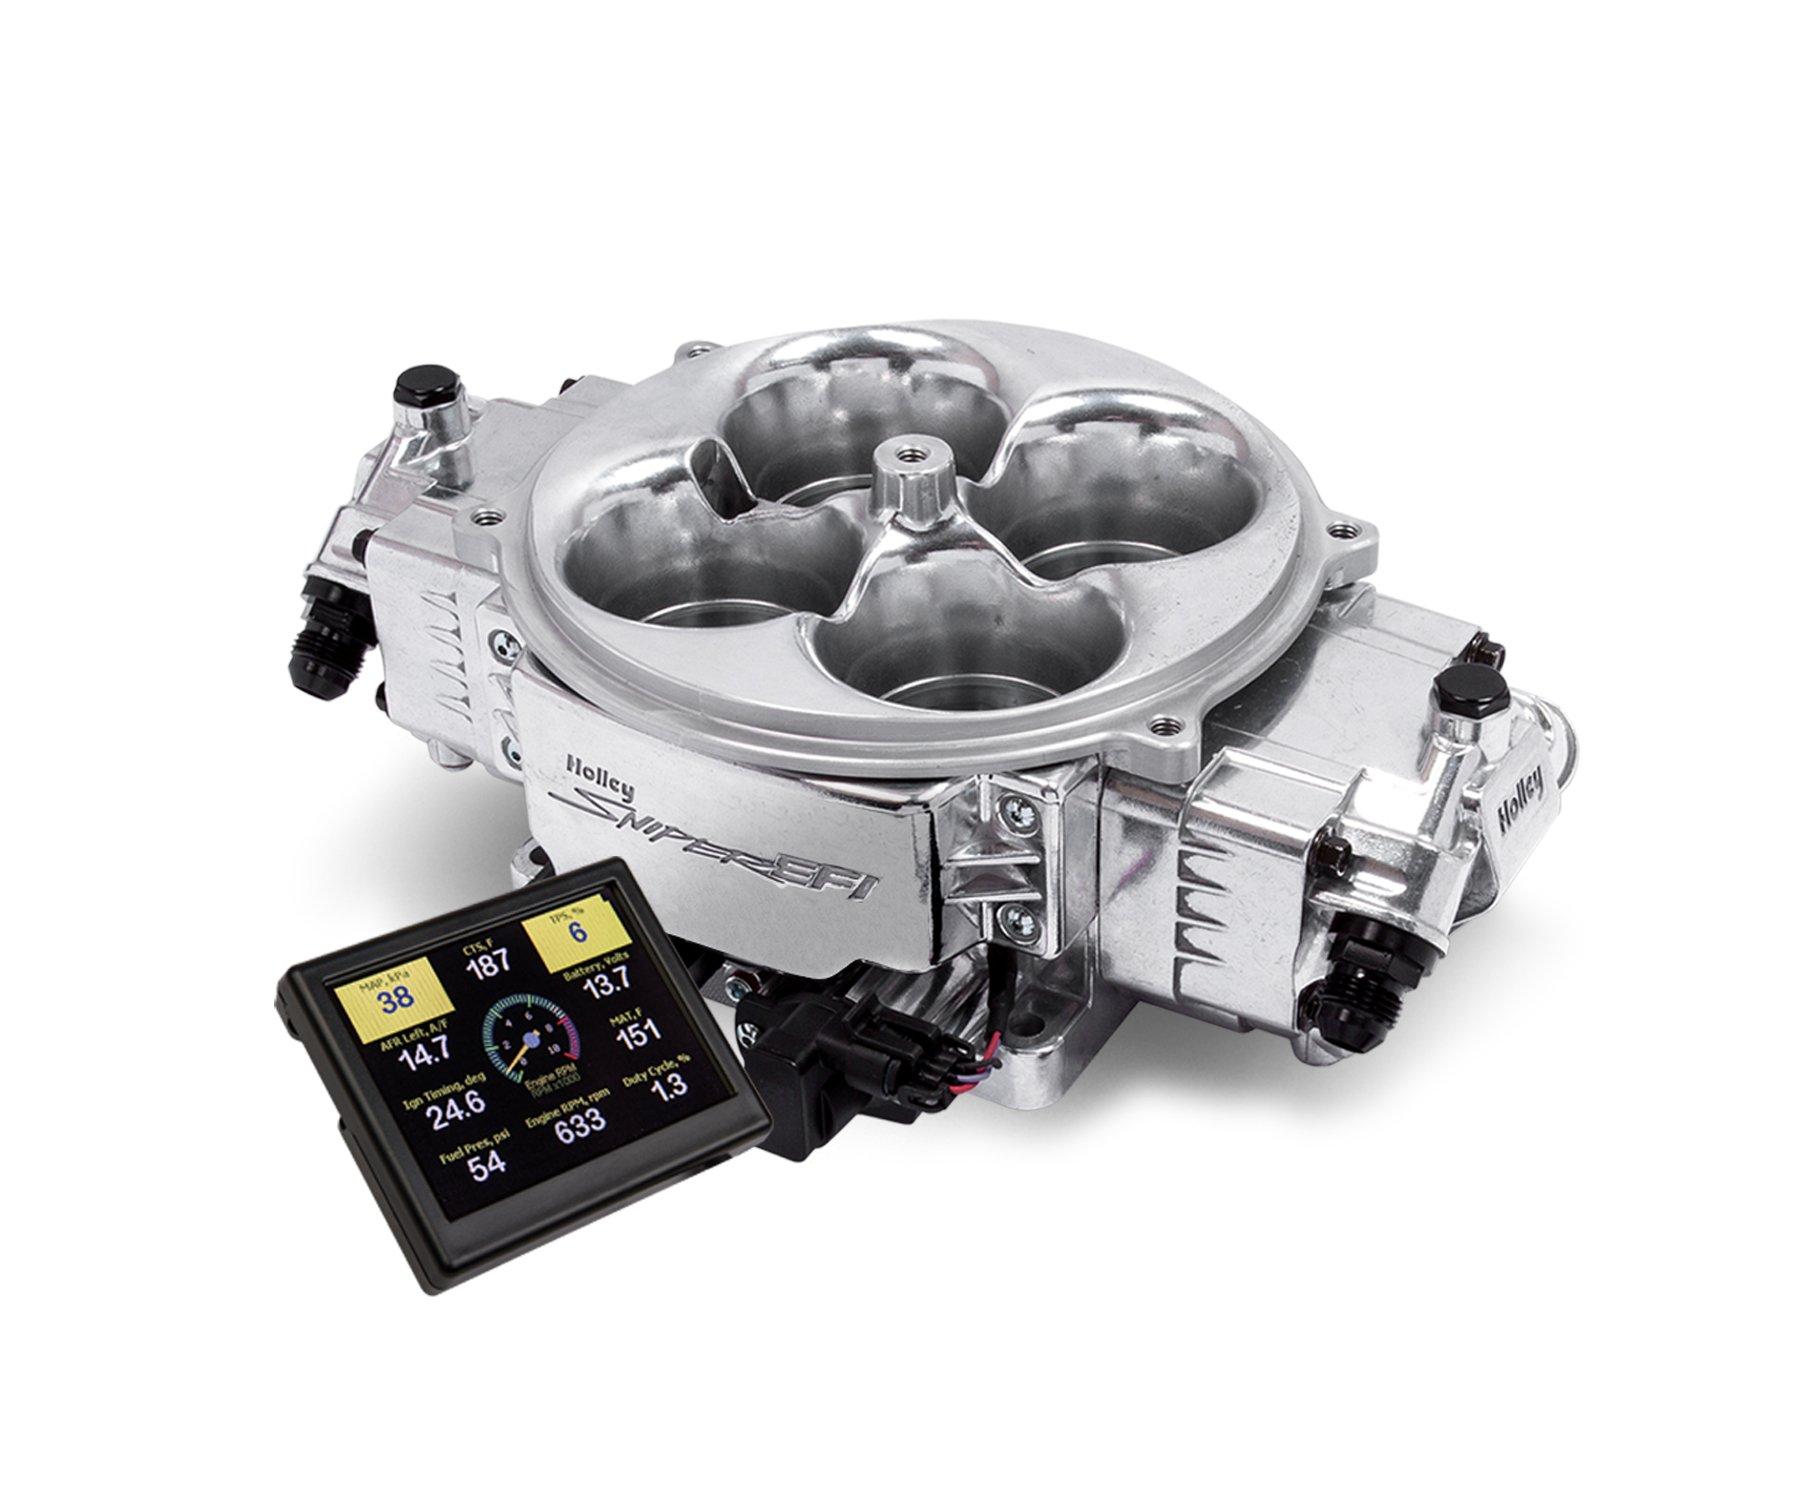 Holley Sniper Efi 550 841 Stealth 4500 Shiny Finish 5v O2 Sensor Circuit Using Lm3914 Led Display For Car Airfuel Mixture Image